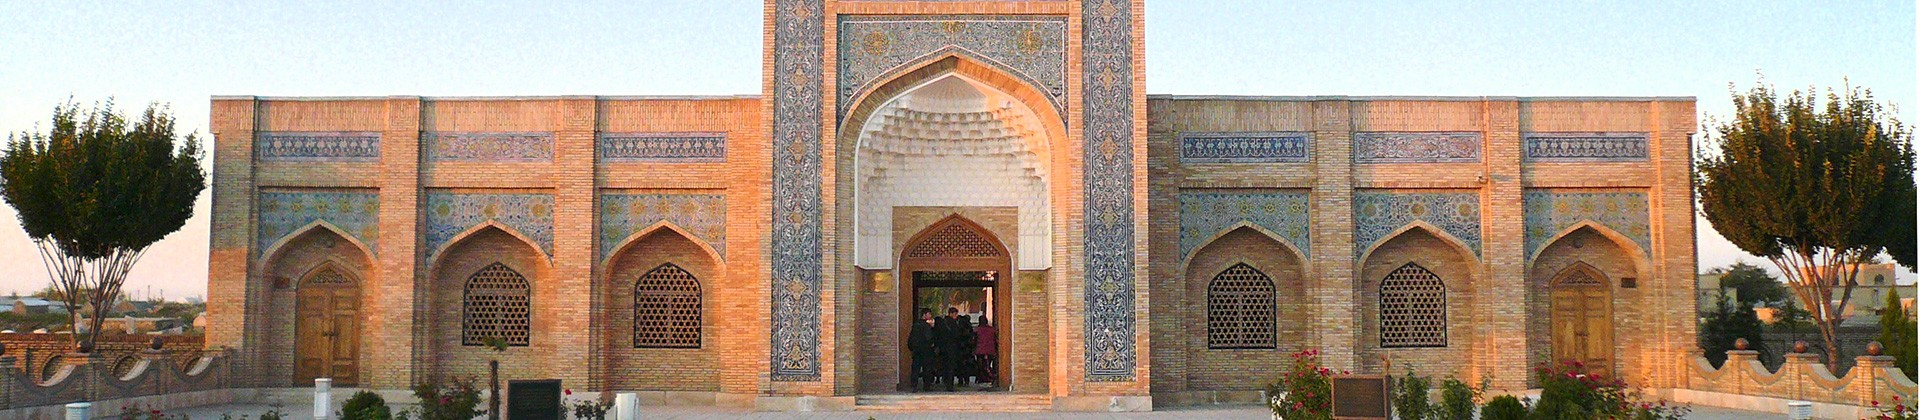 Tomb of Bahauddin Naqshband - 1